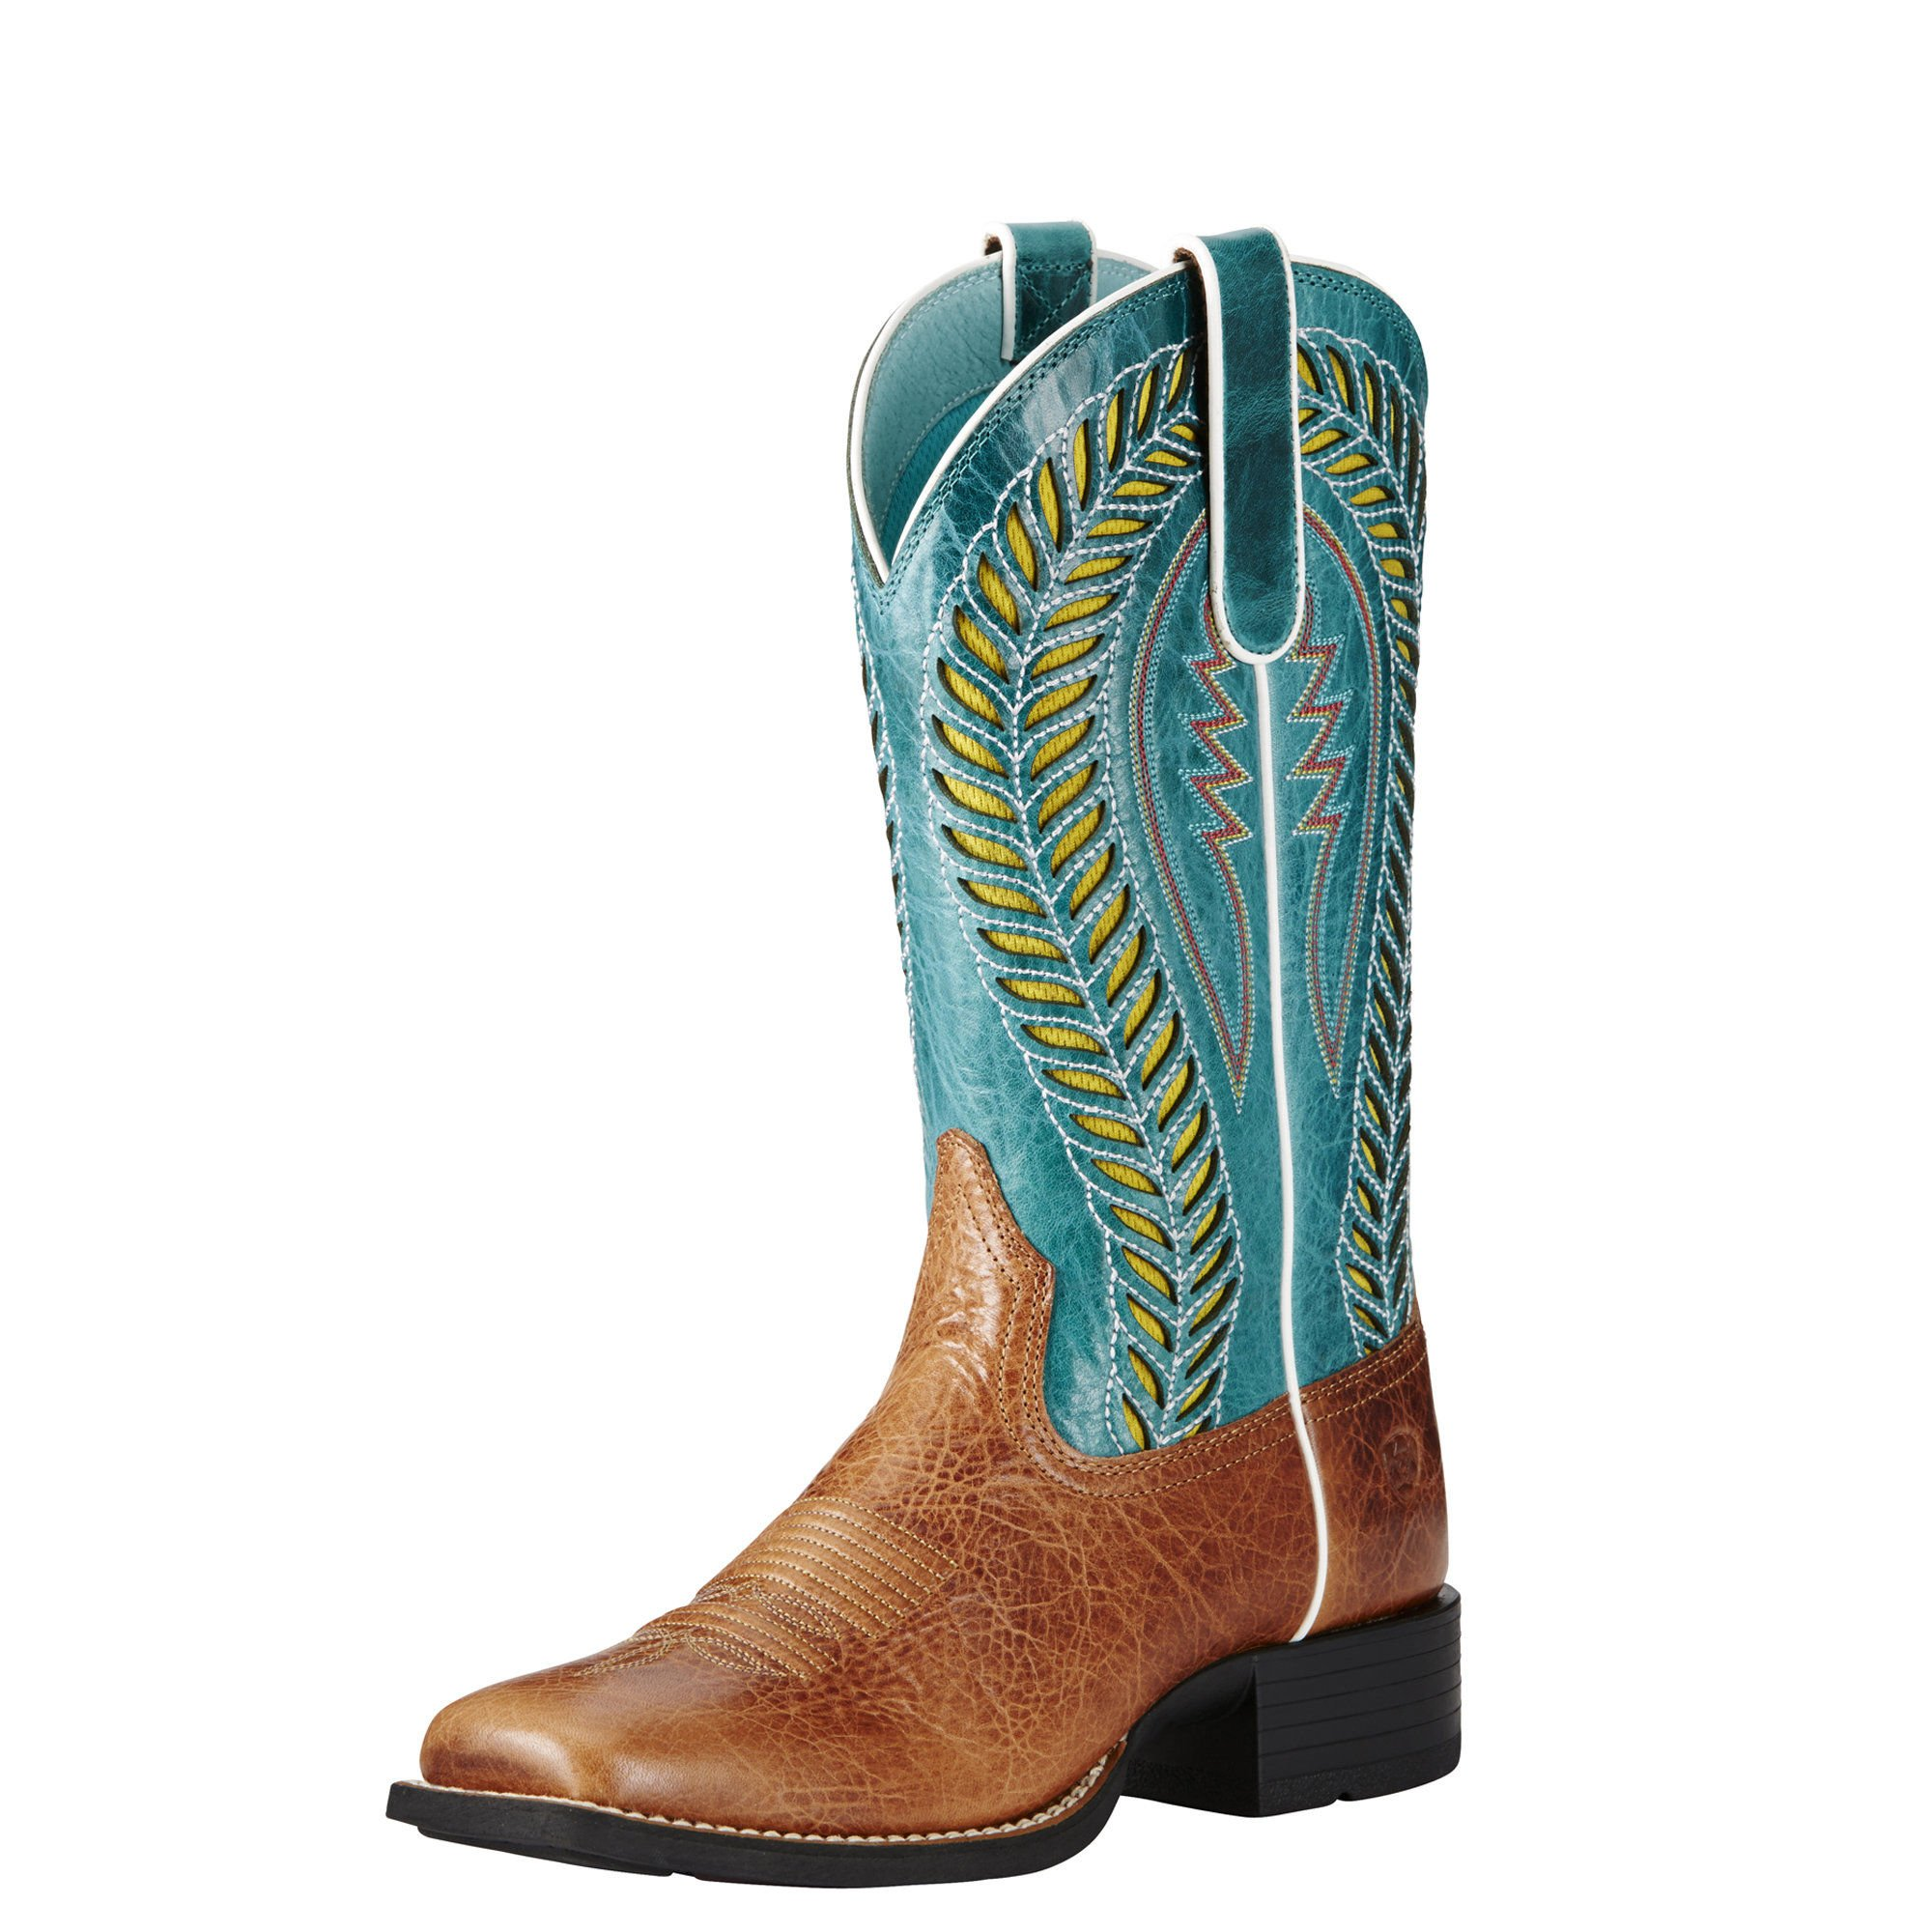 Ariat Women's Quickdraw Venttek Western Cowboy Boot, Gingersnap, 7 B US